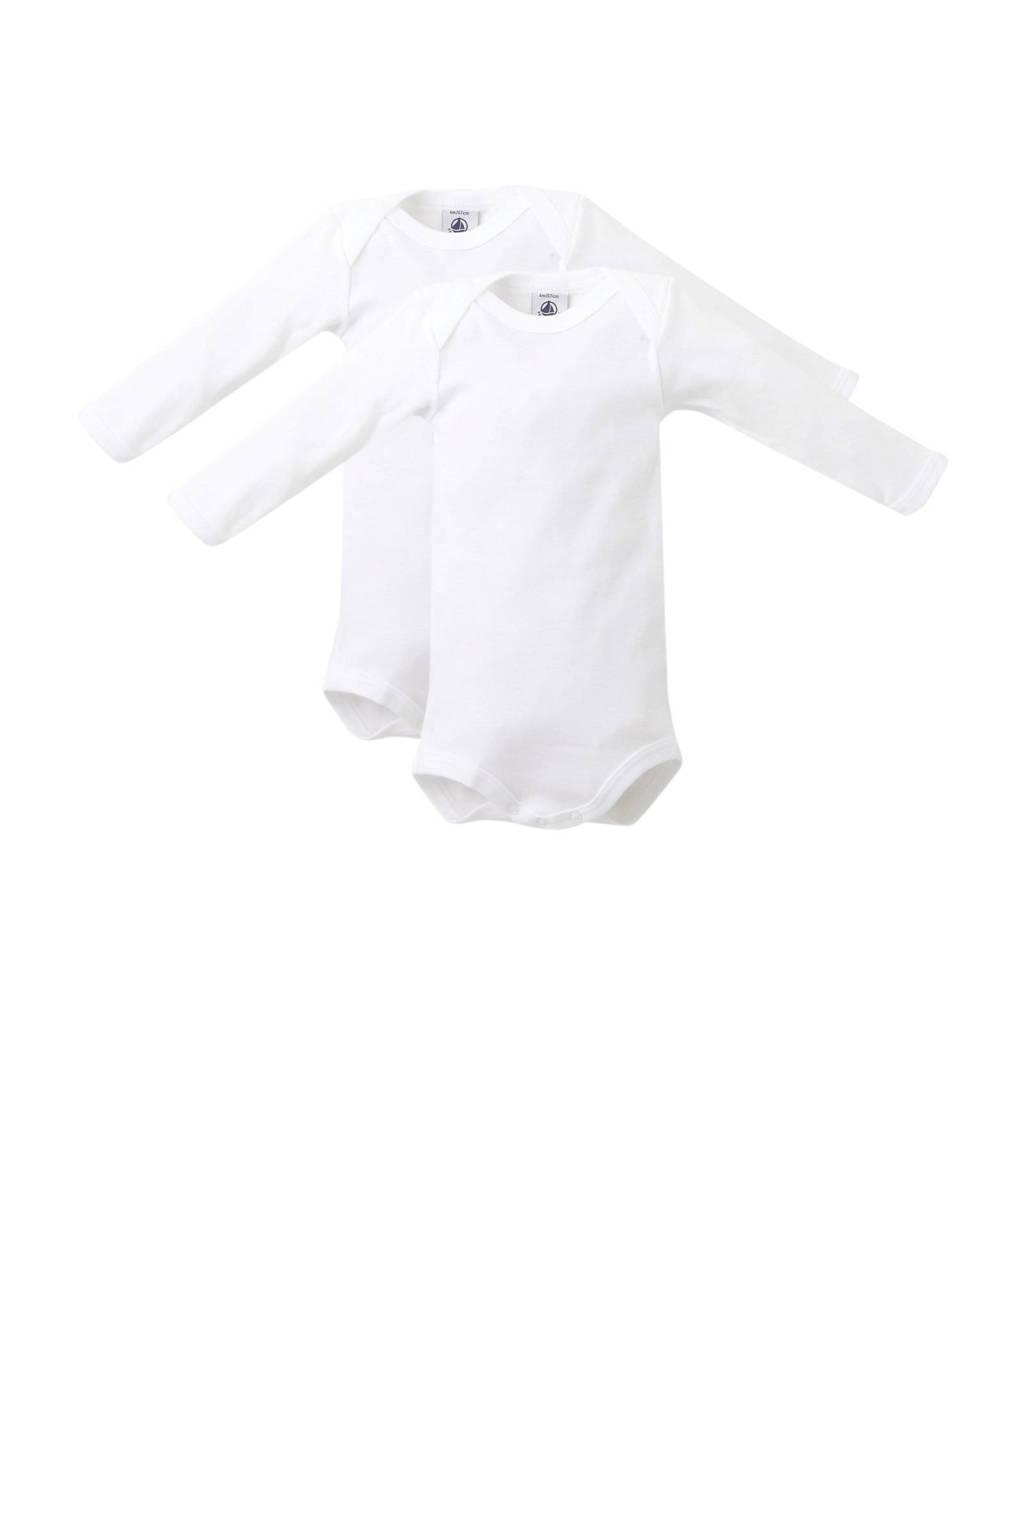 Petit Bateau longsleeve baby romper wit - set van 2, Wit